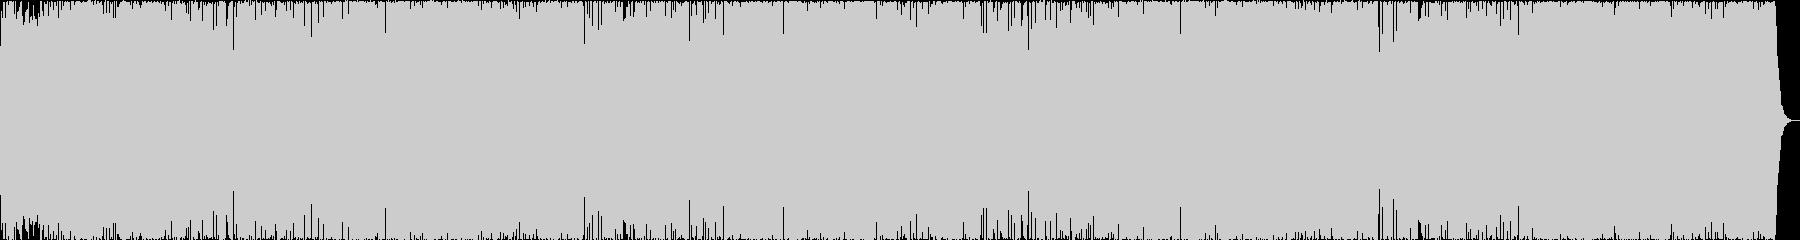 【Eギター生演奏】切ない系メロ・バトルの未再生の波形